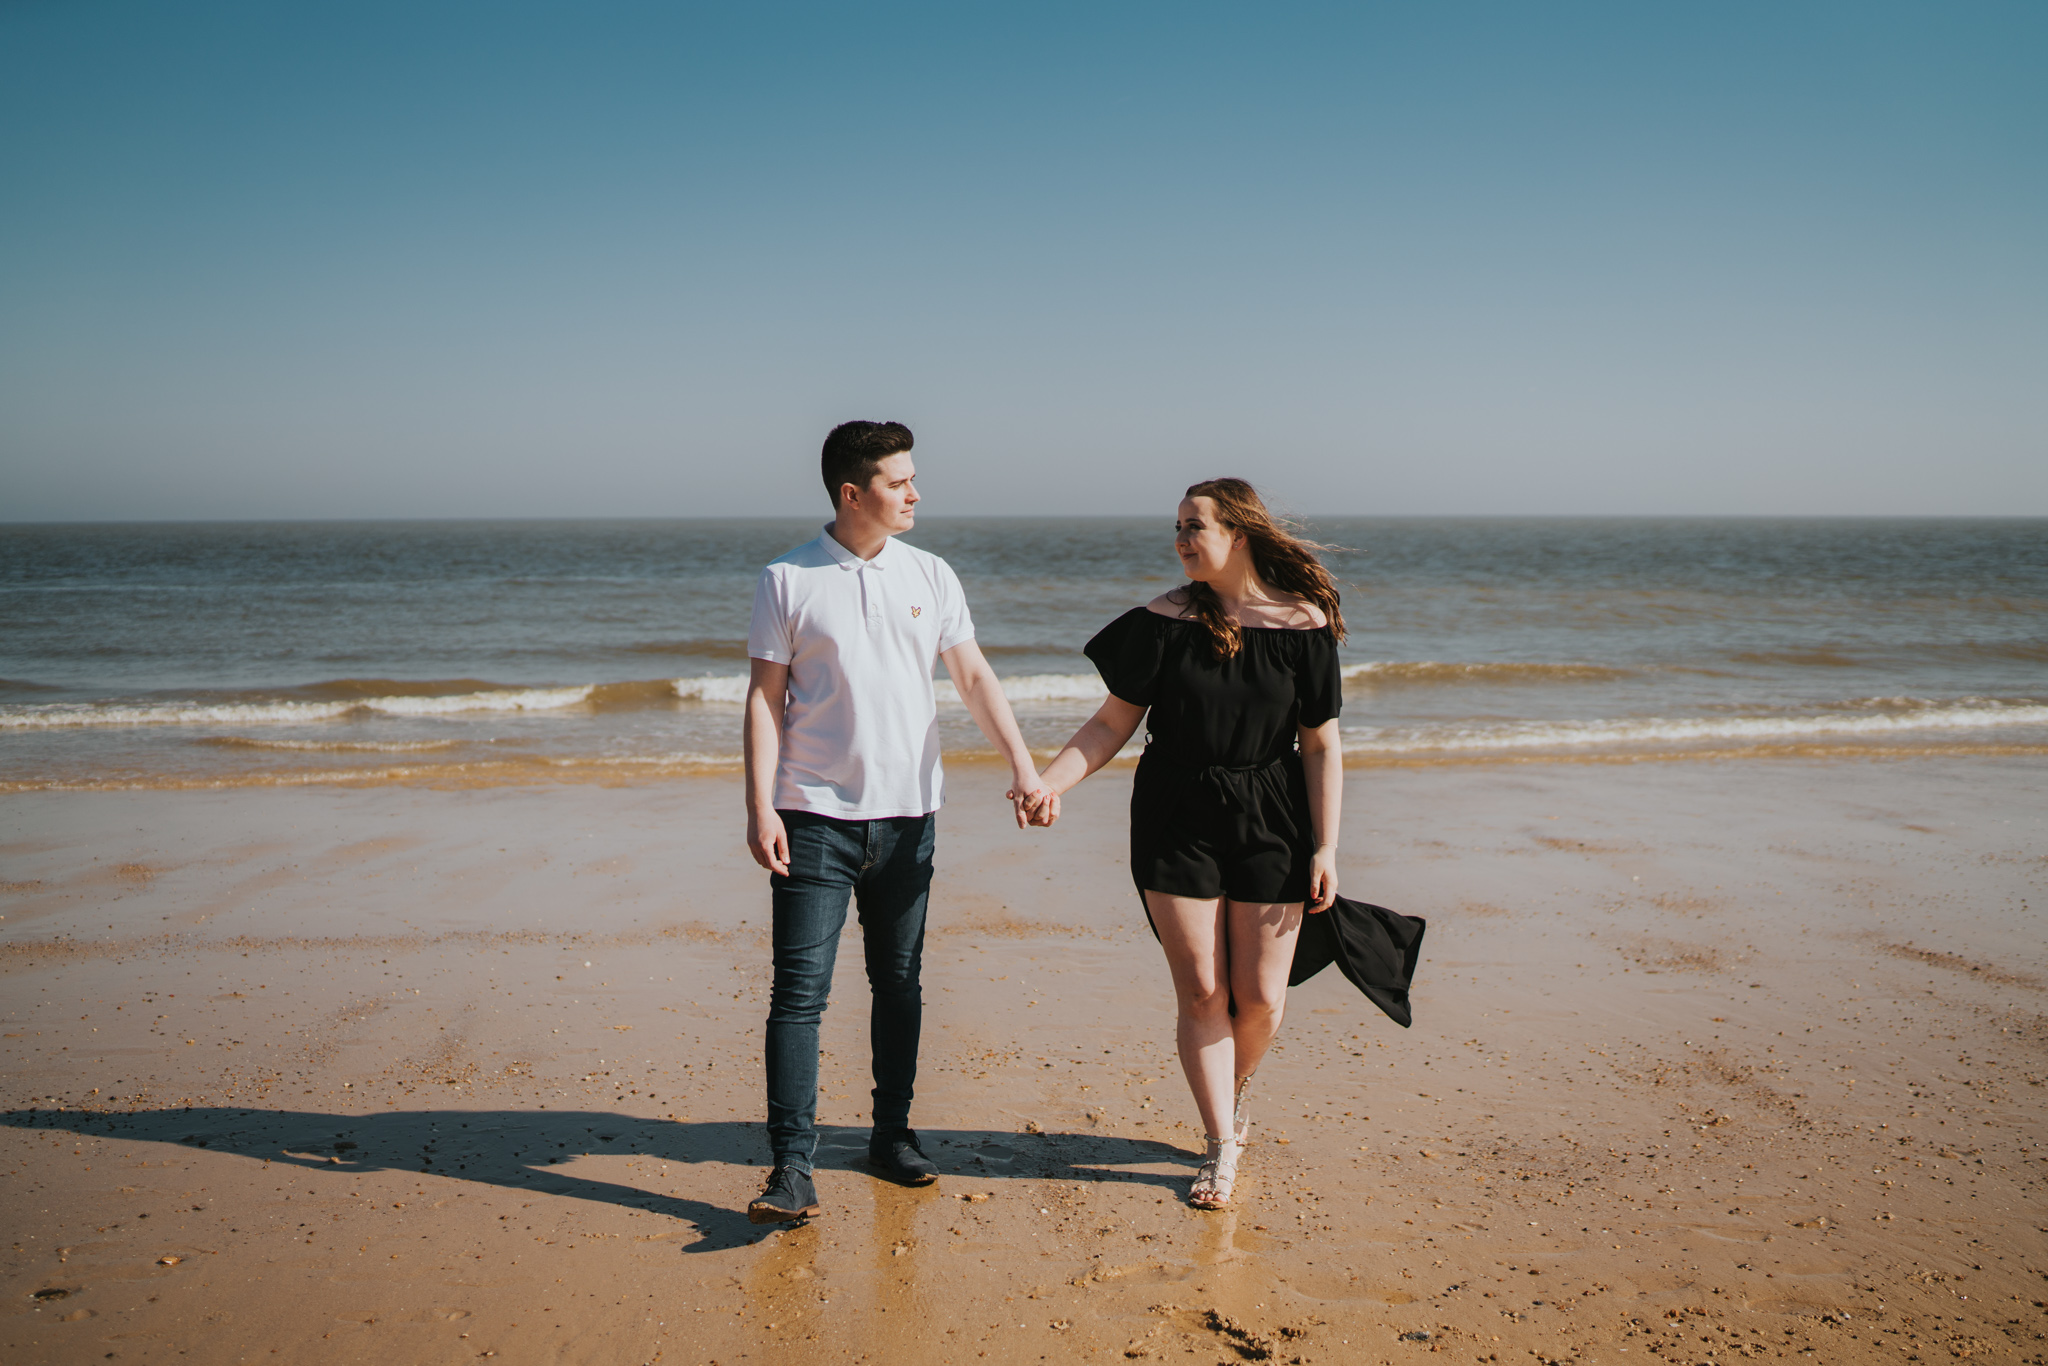 steph-peter-relaxed-frinton-beach-engagement-session-grace-elizabeth-colchester-essex-alternative-wedding-lifestyle-photographer-essex-suffolk-norfolk-devon (10 of 16).jpg